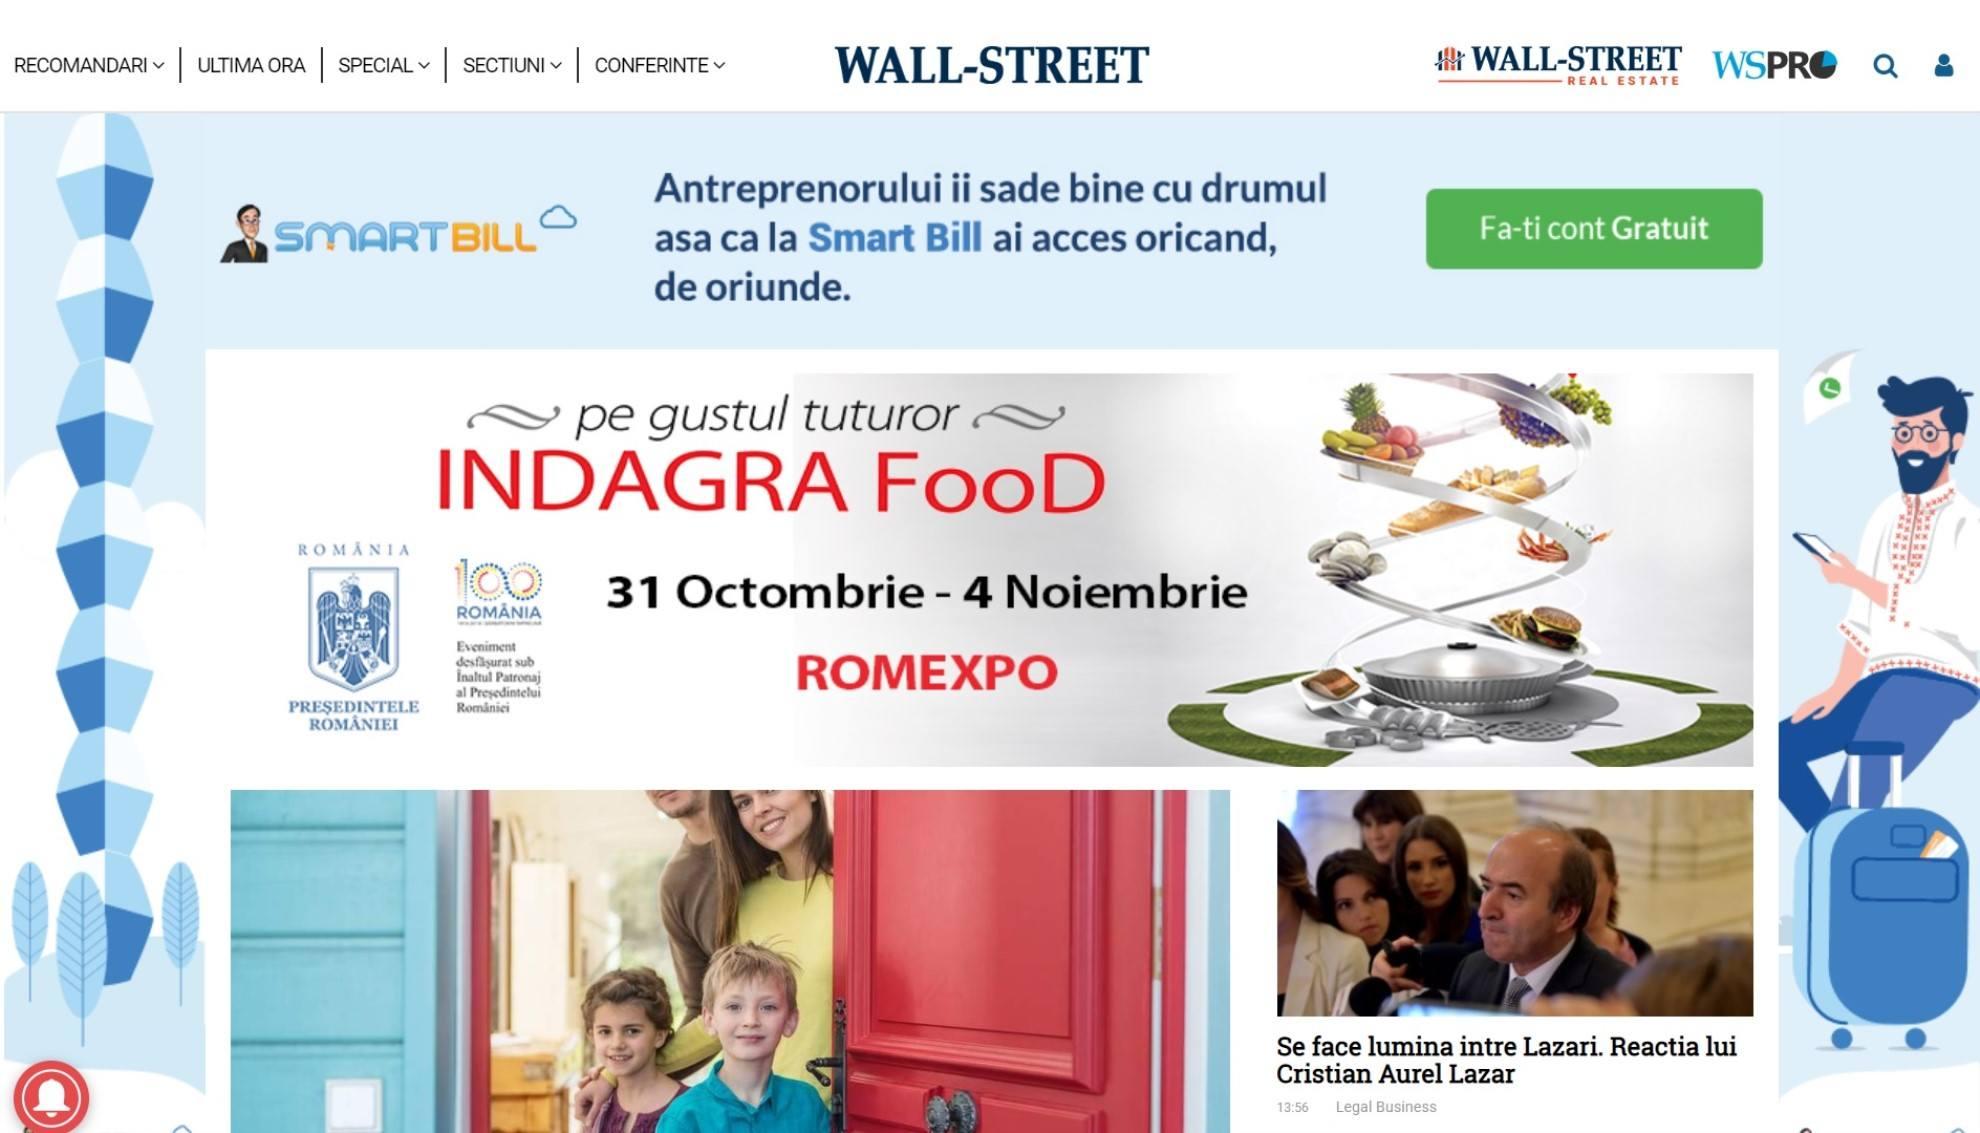 Wall-Street.ro: ultimele stiri online din economie si afaceri